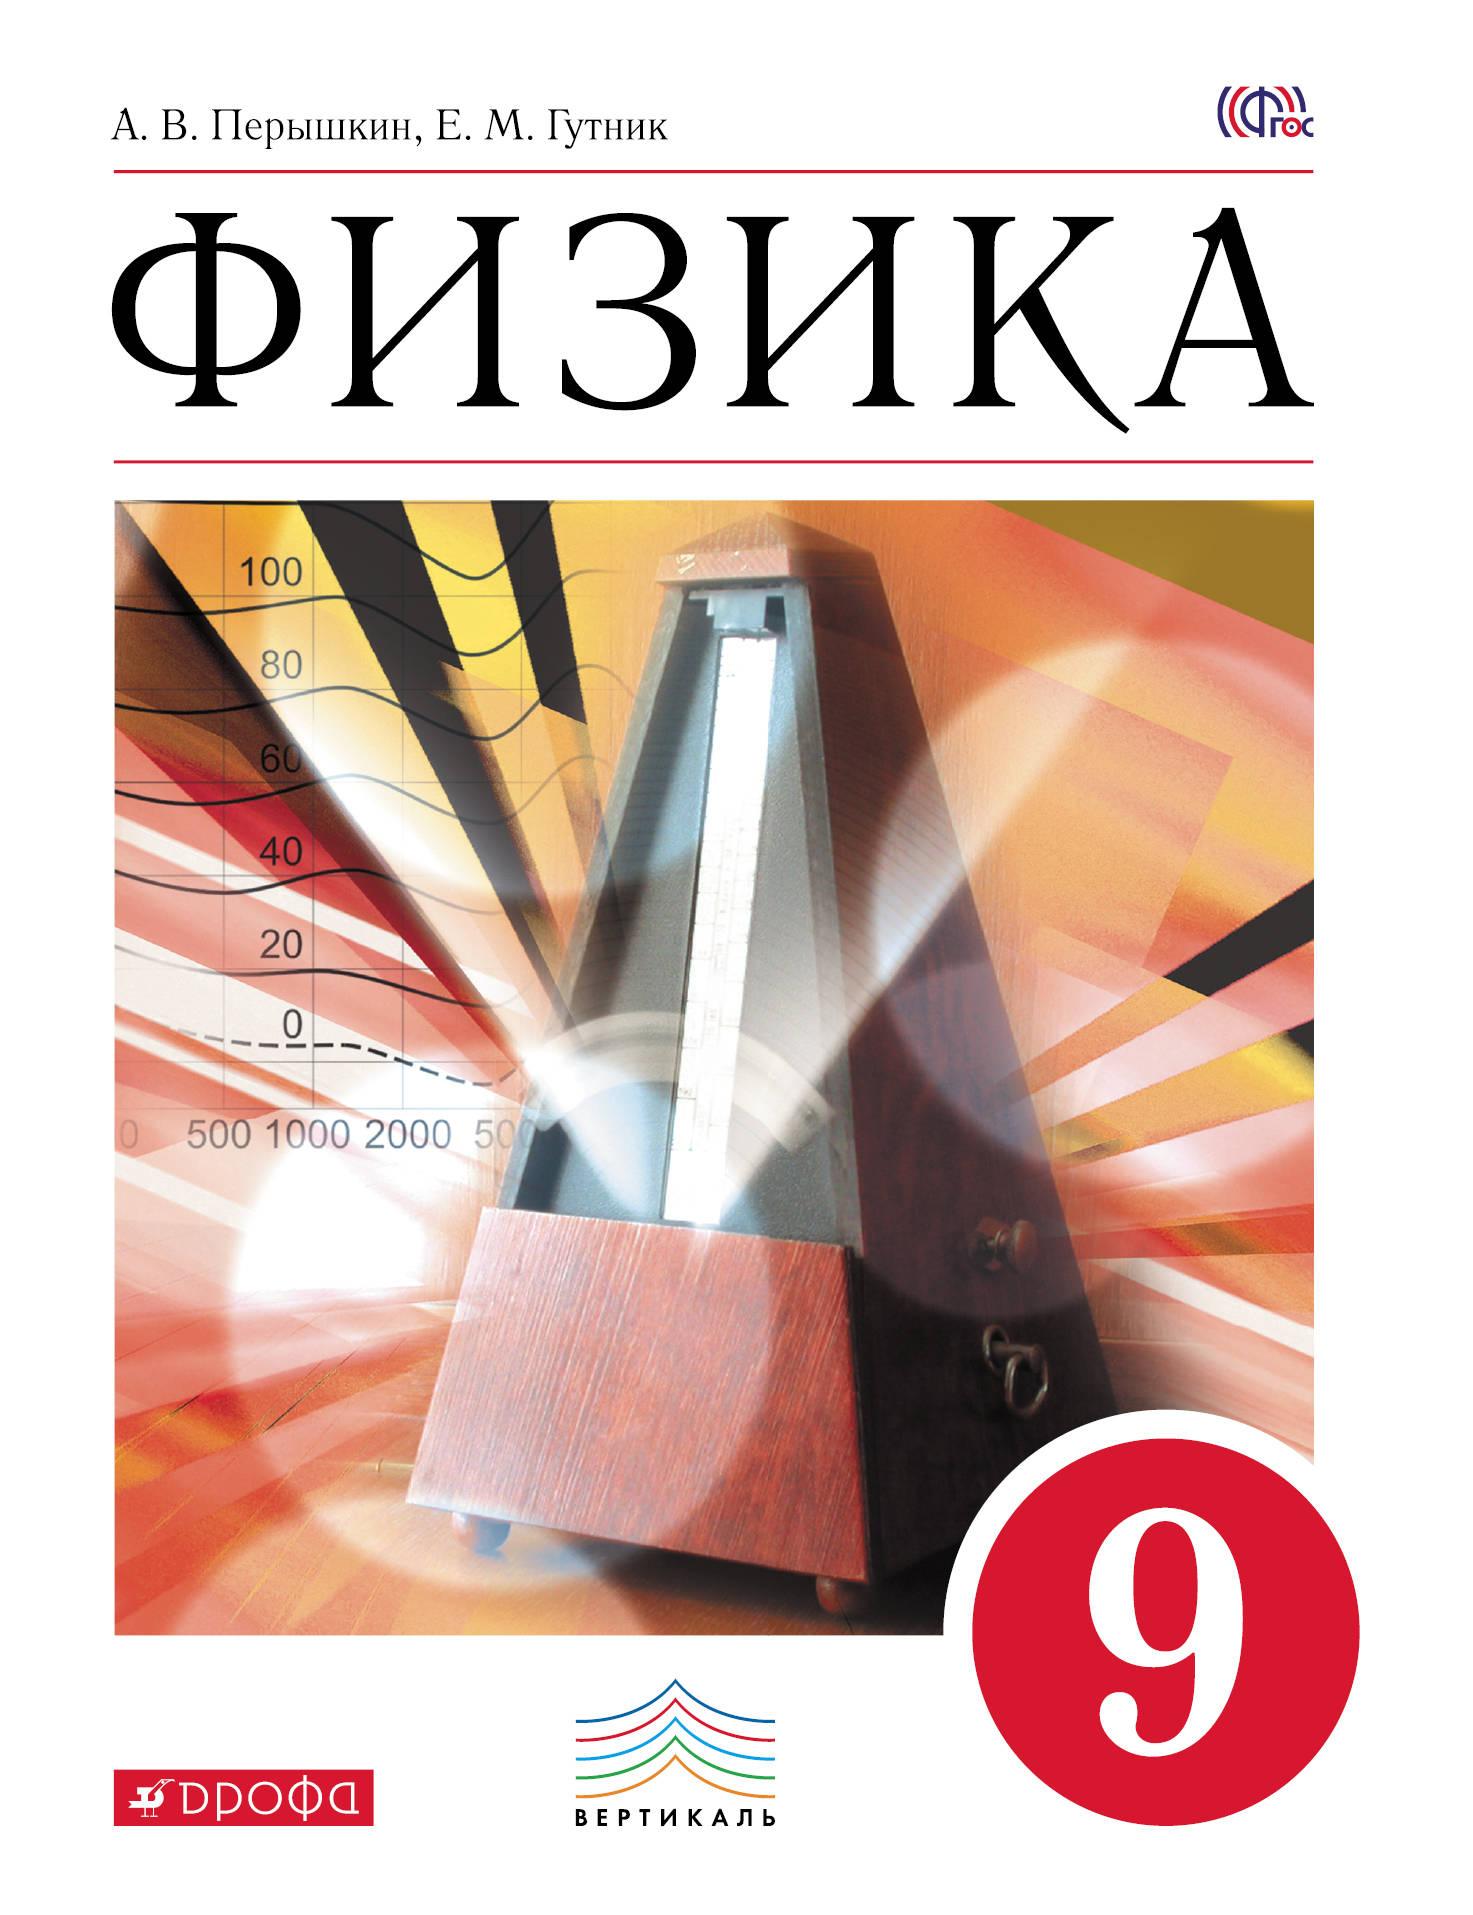 А. В. Перышкин, Е. М. Гутник Физика. 9 класс. Учебник